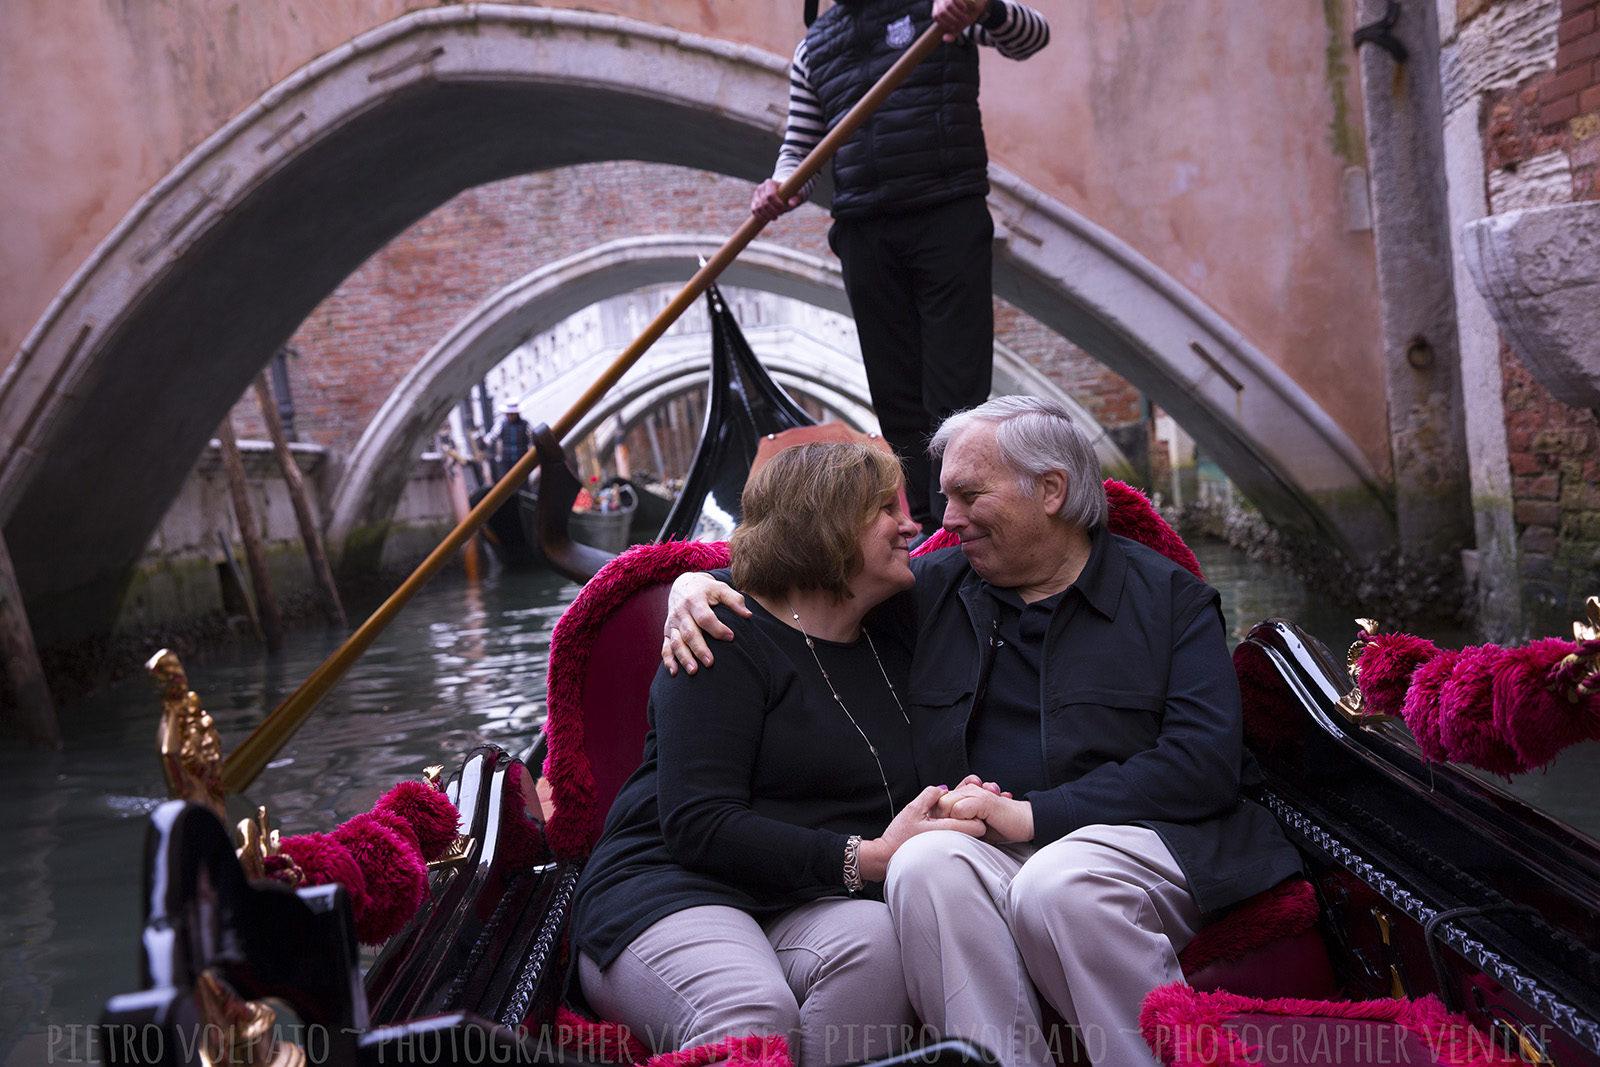 photographer-venice-italy-couple-vacation-photo-shoot-tour-20170321_02